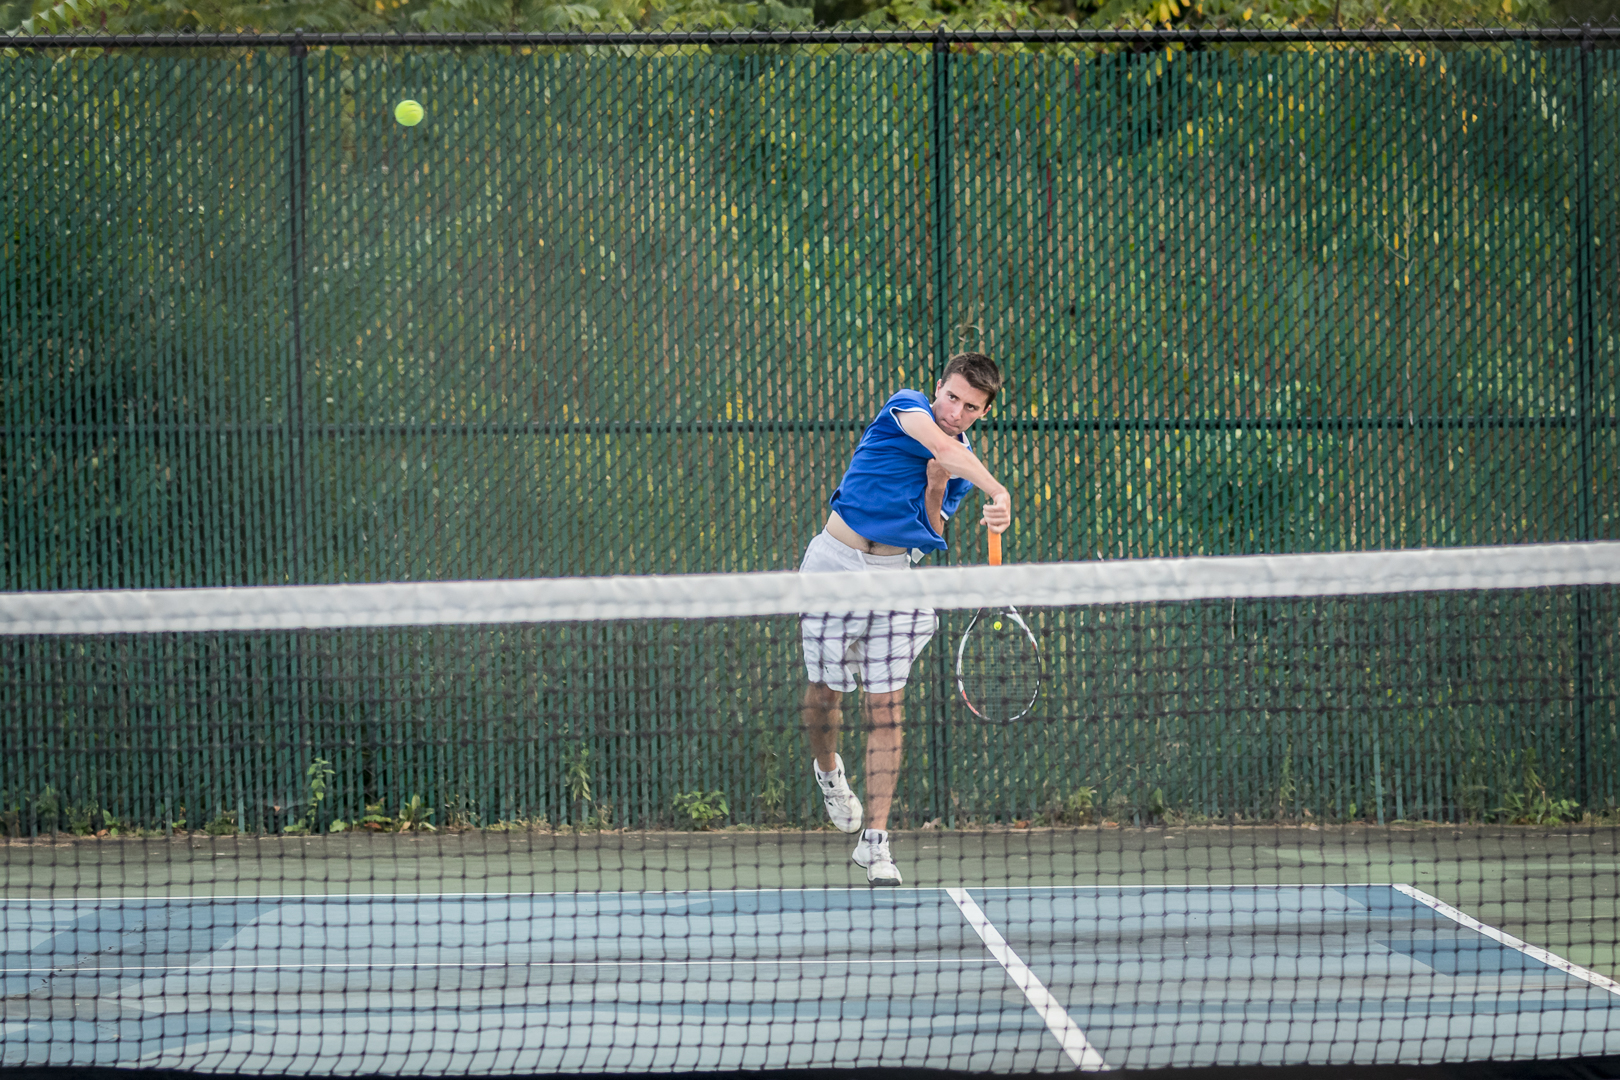 Marian-Boys-Tennis-1779.jpg